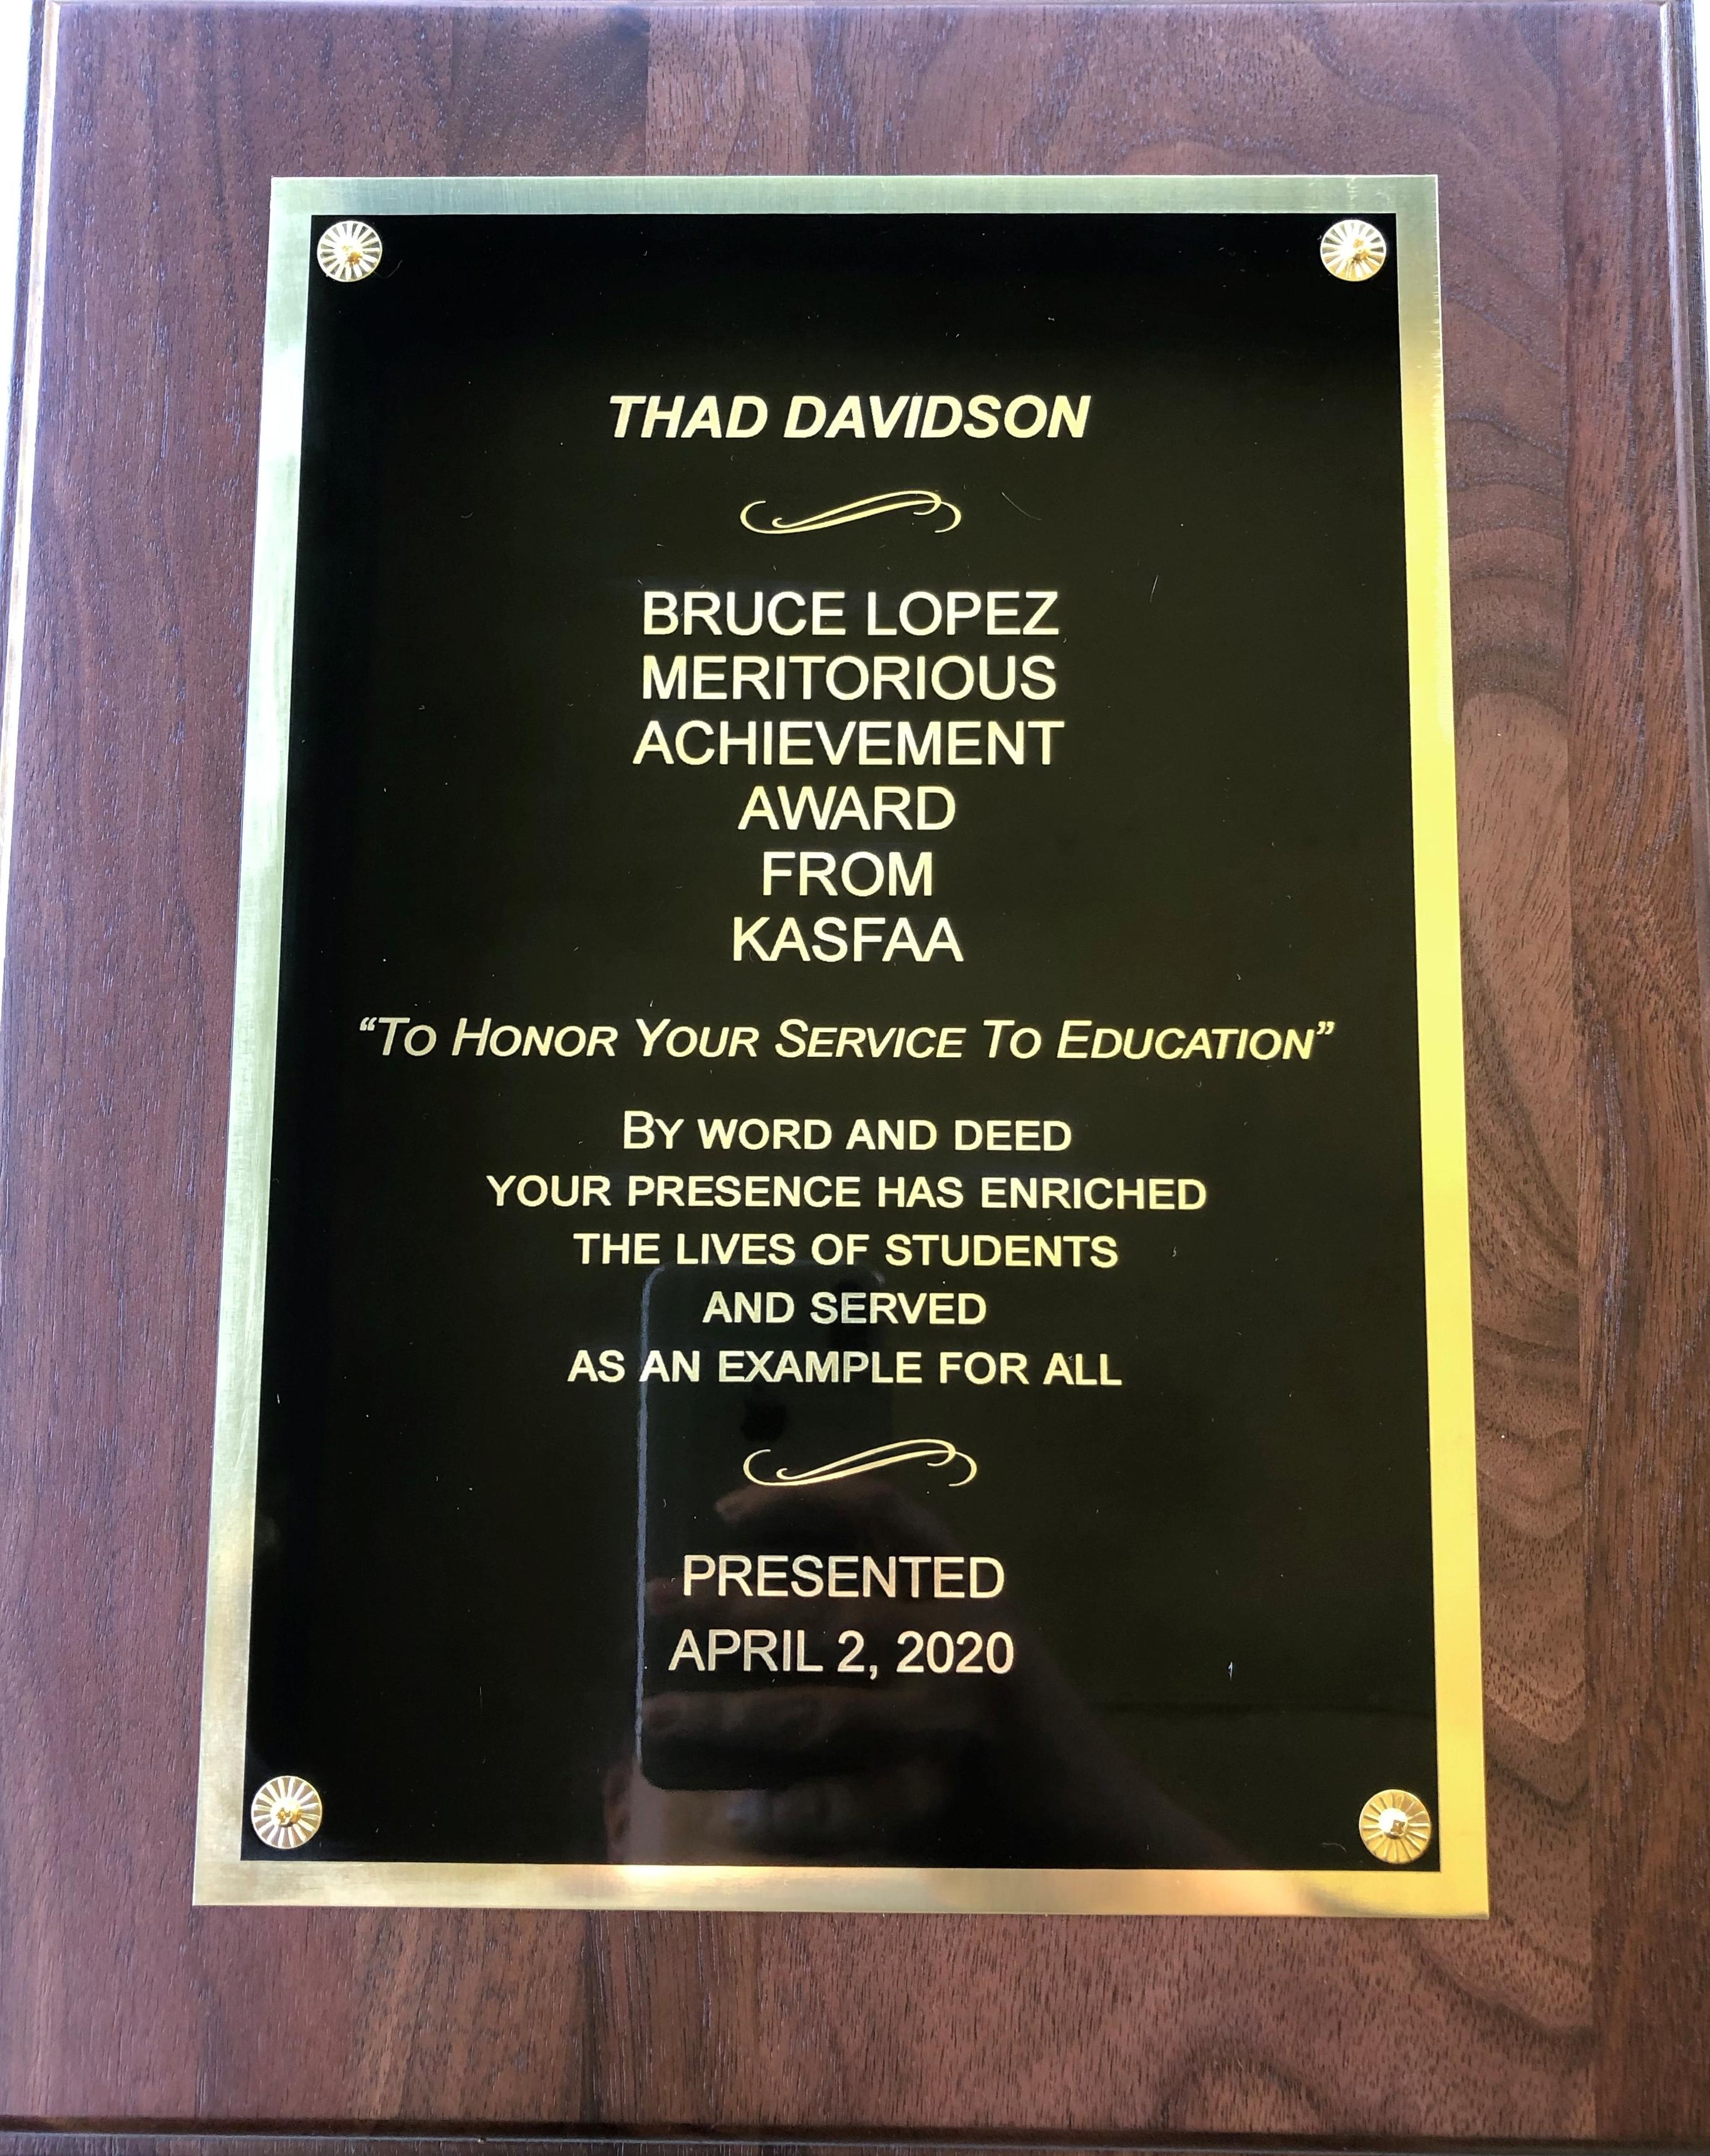 Bruce lopez Meritorious Achievement Award 2020 - Thad